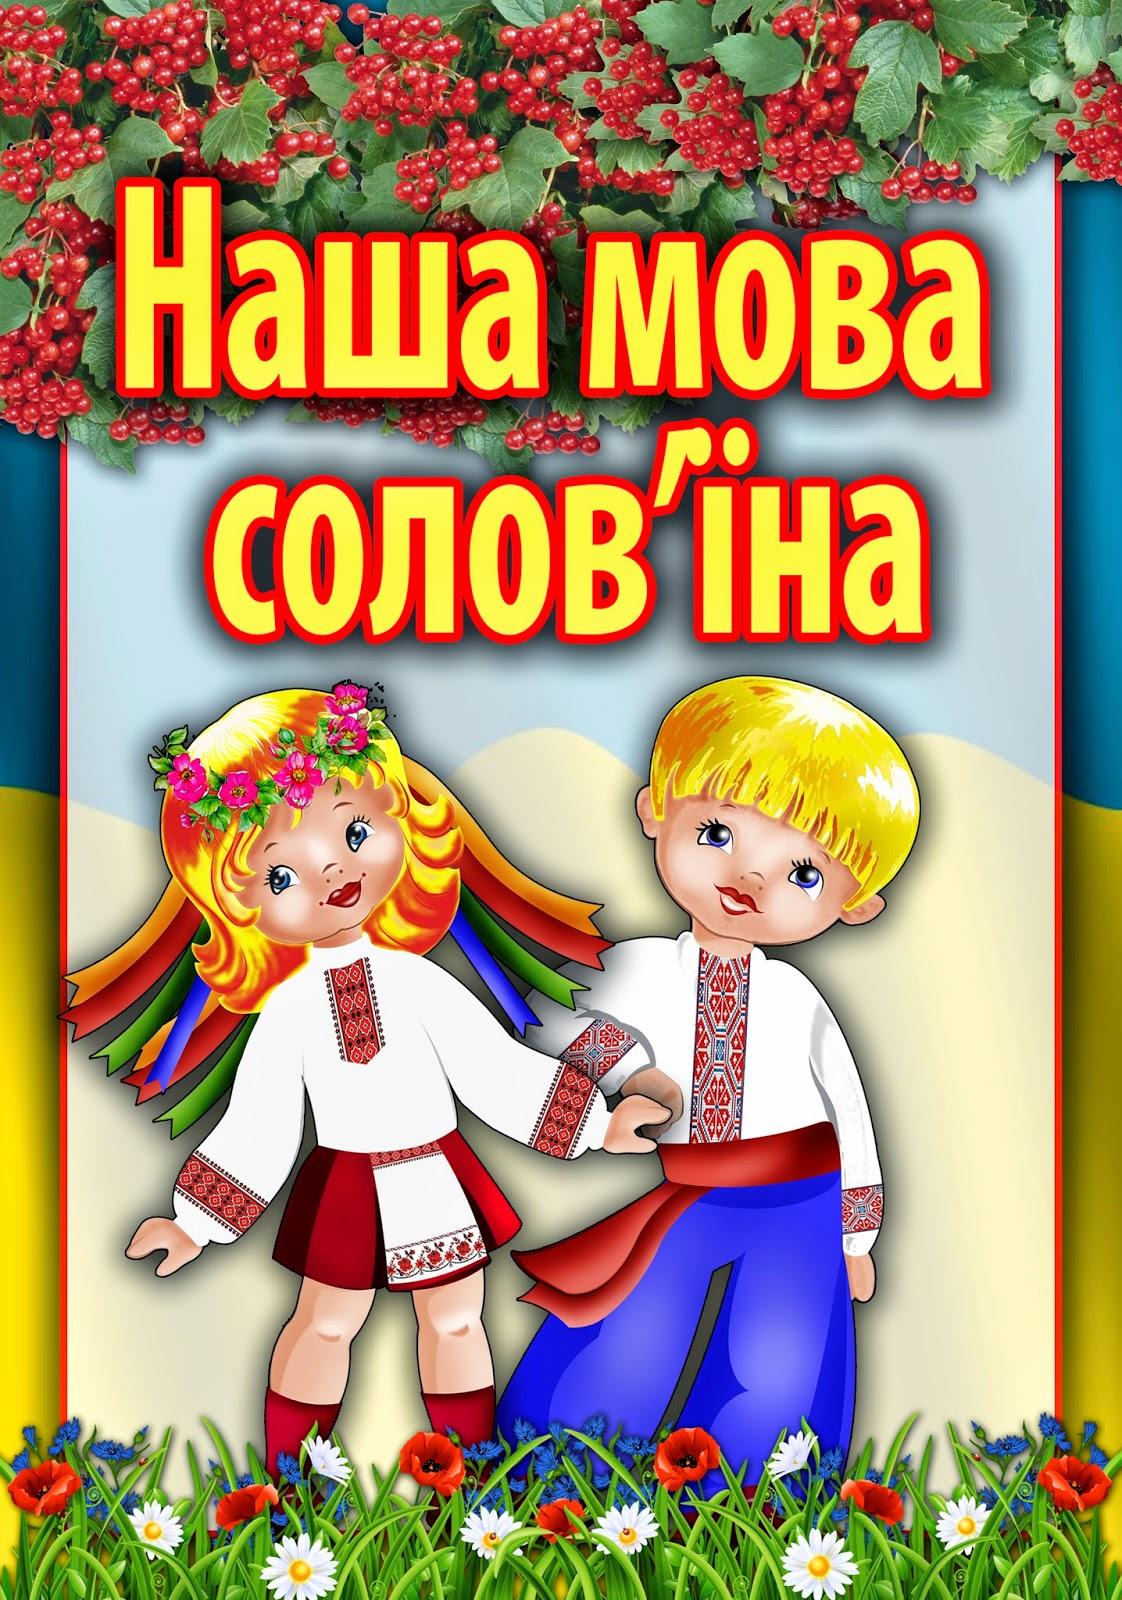 вислови про українську символіку оборудование для проведения